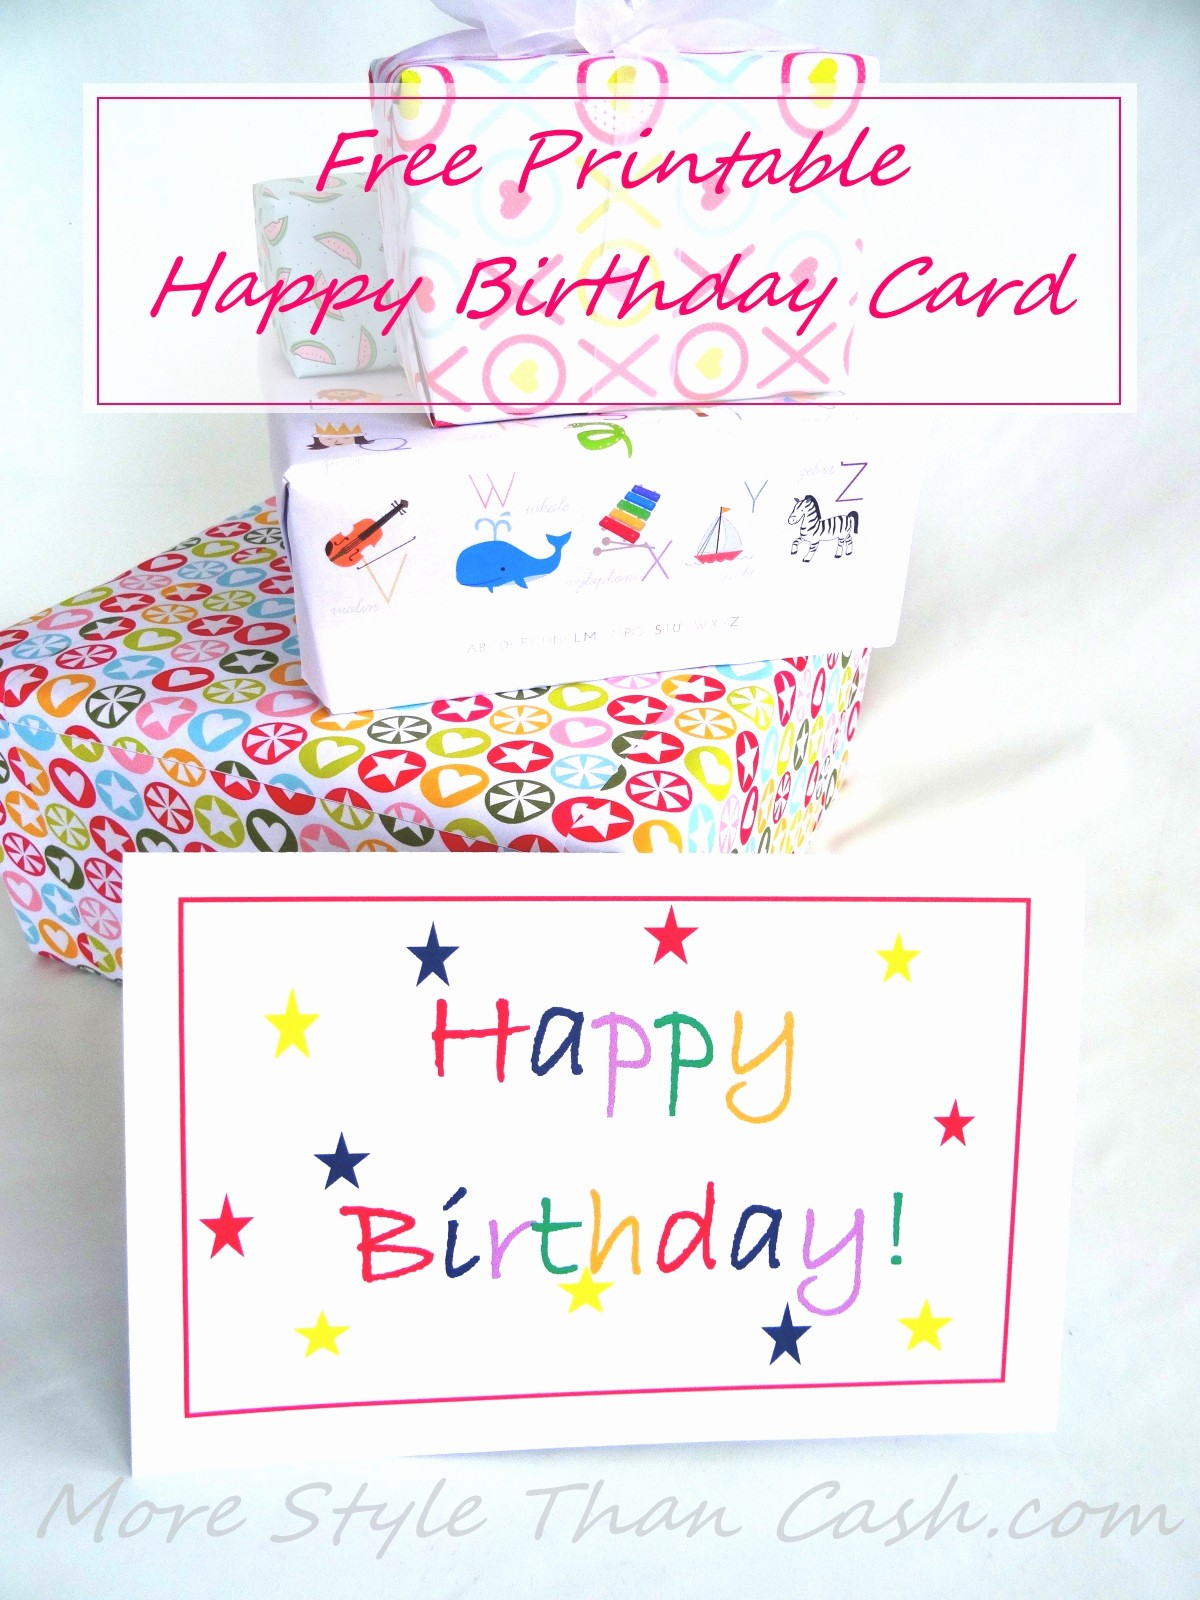 Happy Birthday Certificate Free Printable Lovely Free Printable Birthday Card